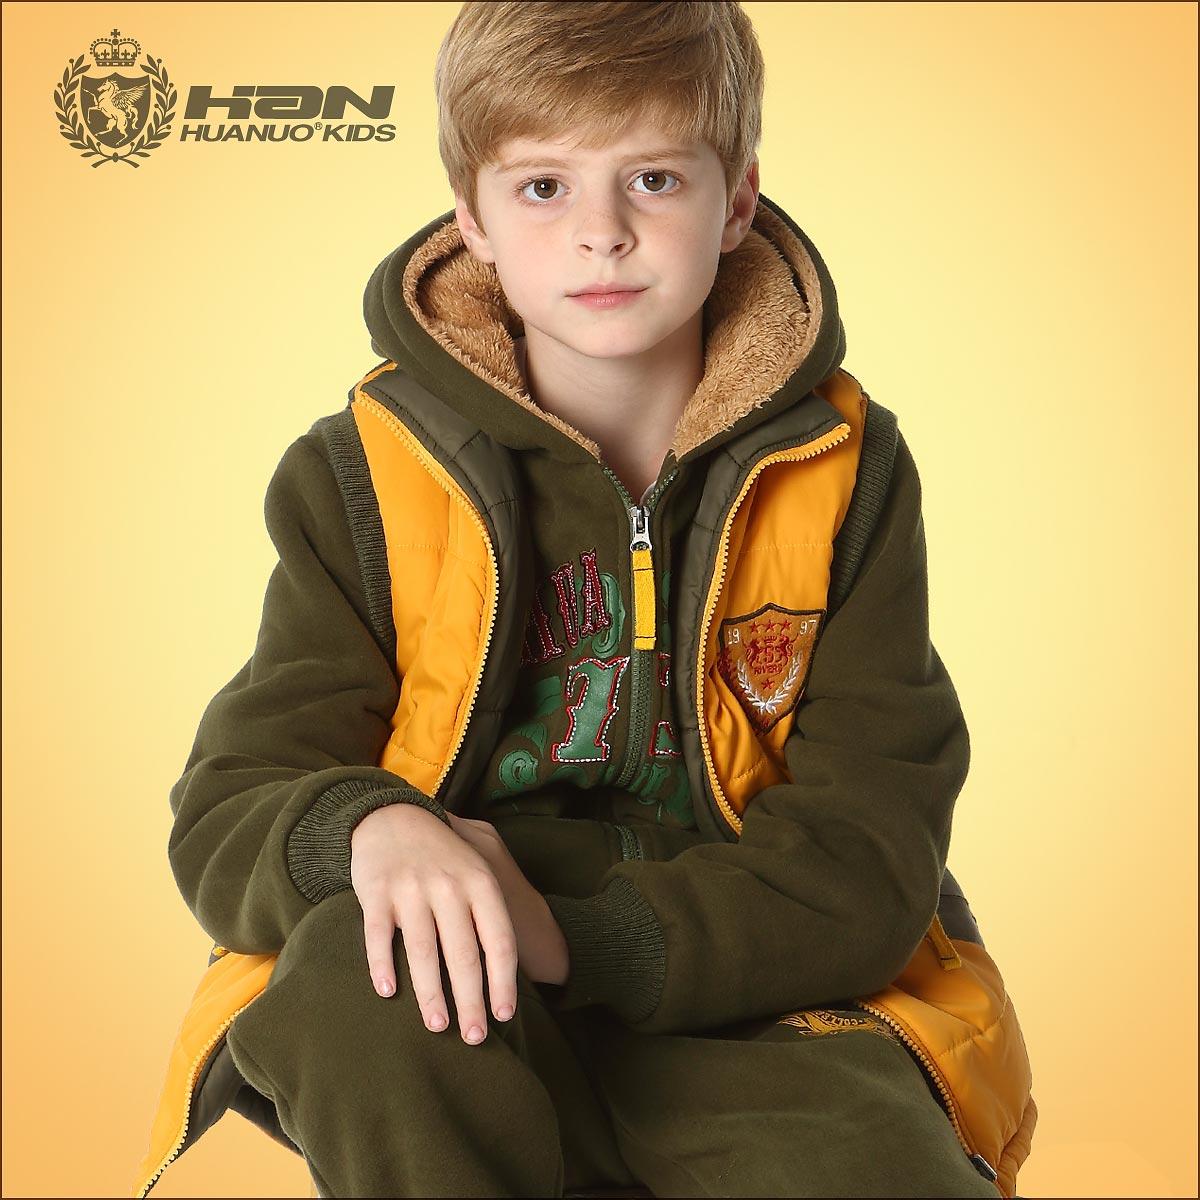 детский костюм Connaught 047 2013